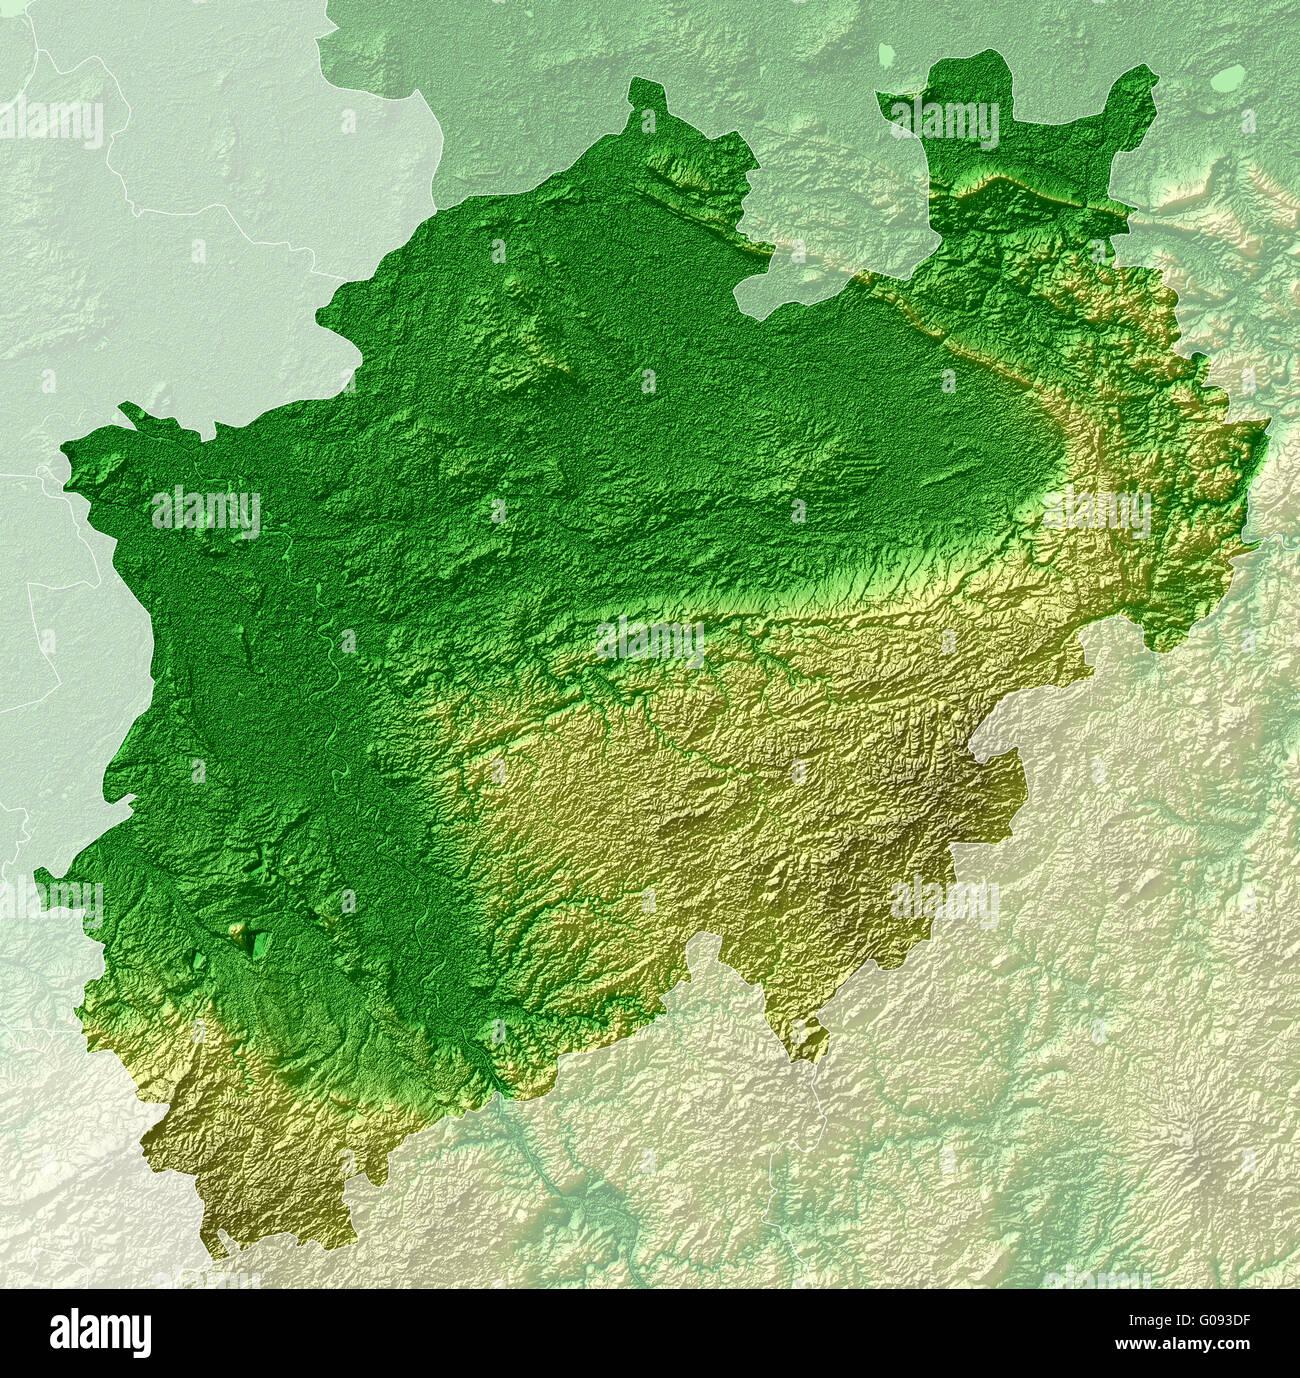 Topographische Karte Nrw.Nordrhein Westfalen Topographische Reliefkarte Stockfoto Bild